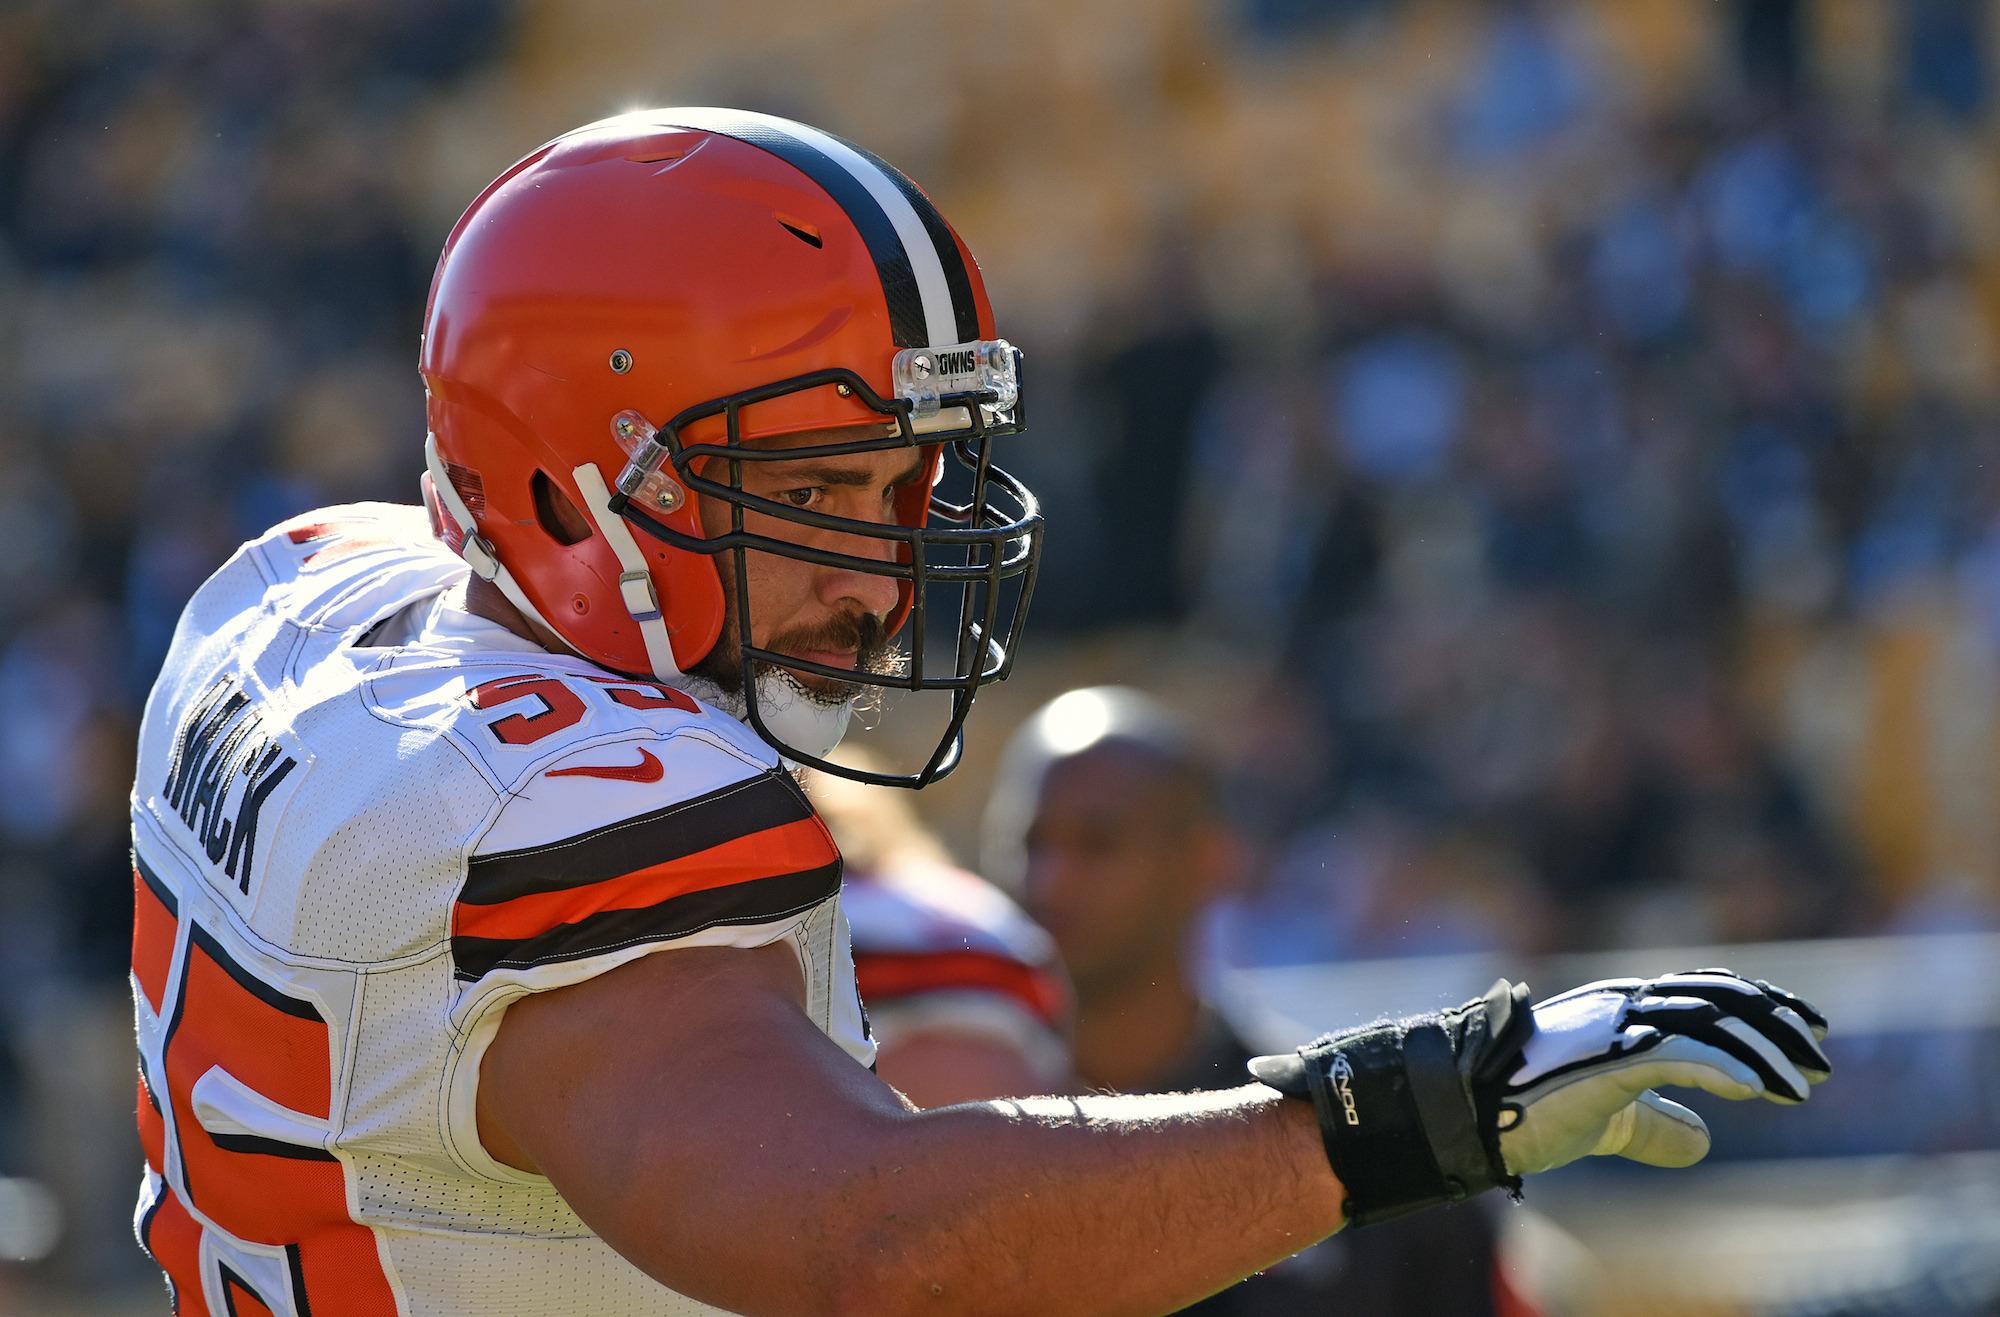 NFL Jerseys Cheap - NFL impact players on new teams   Yardbarker.com